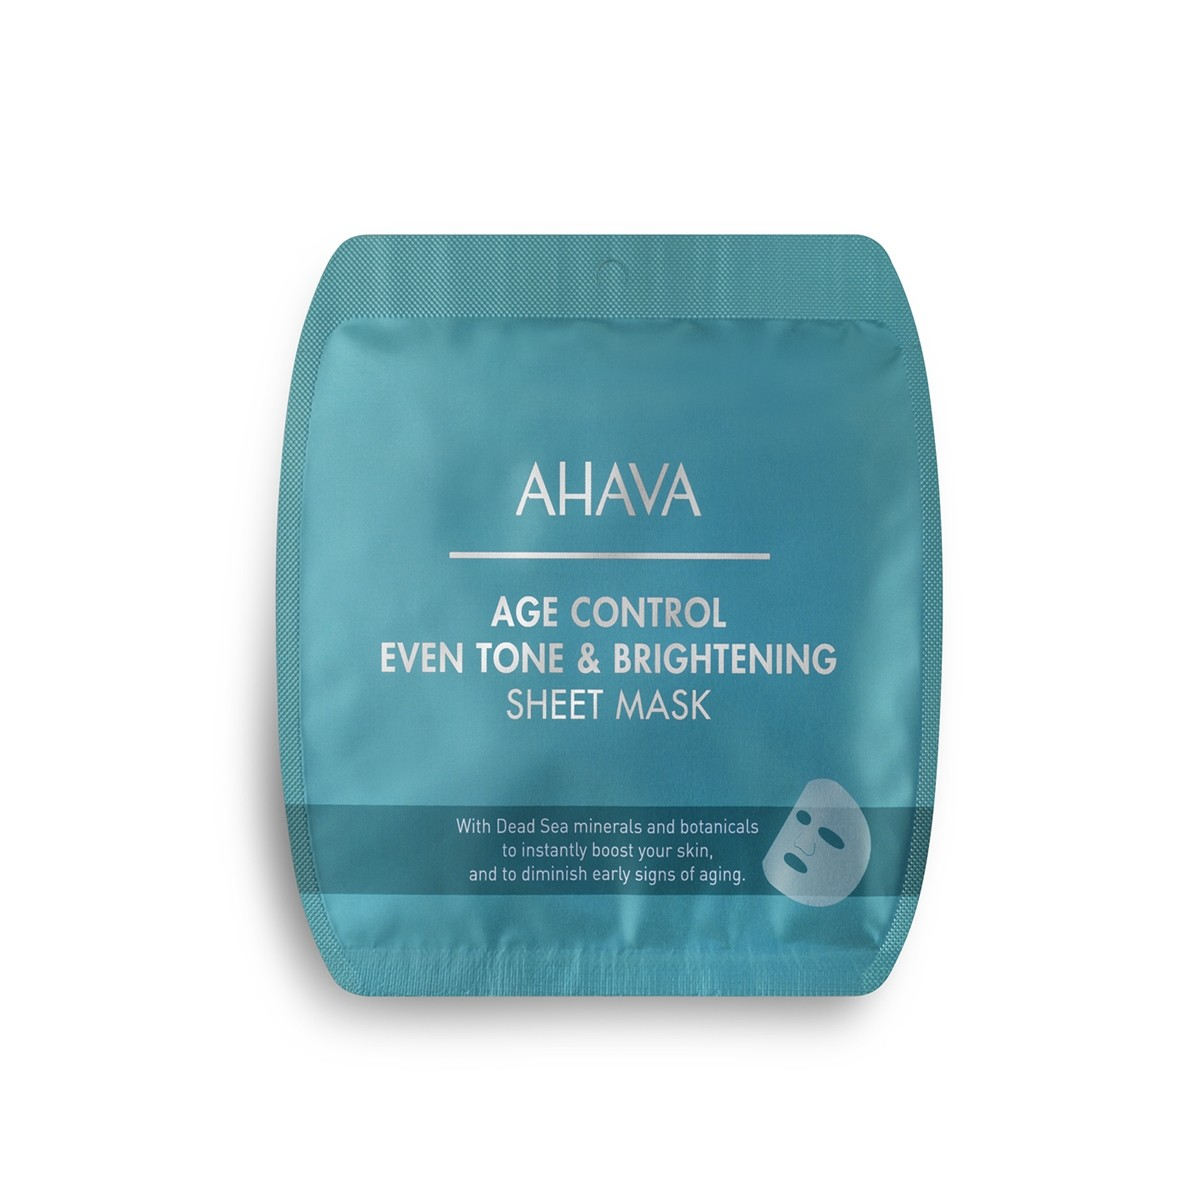 Ahava Age Control Even Tone & Brightenning Sheet Mask,  Masca Pentru Intinerirea si Fermitatea Tenului, 17 g